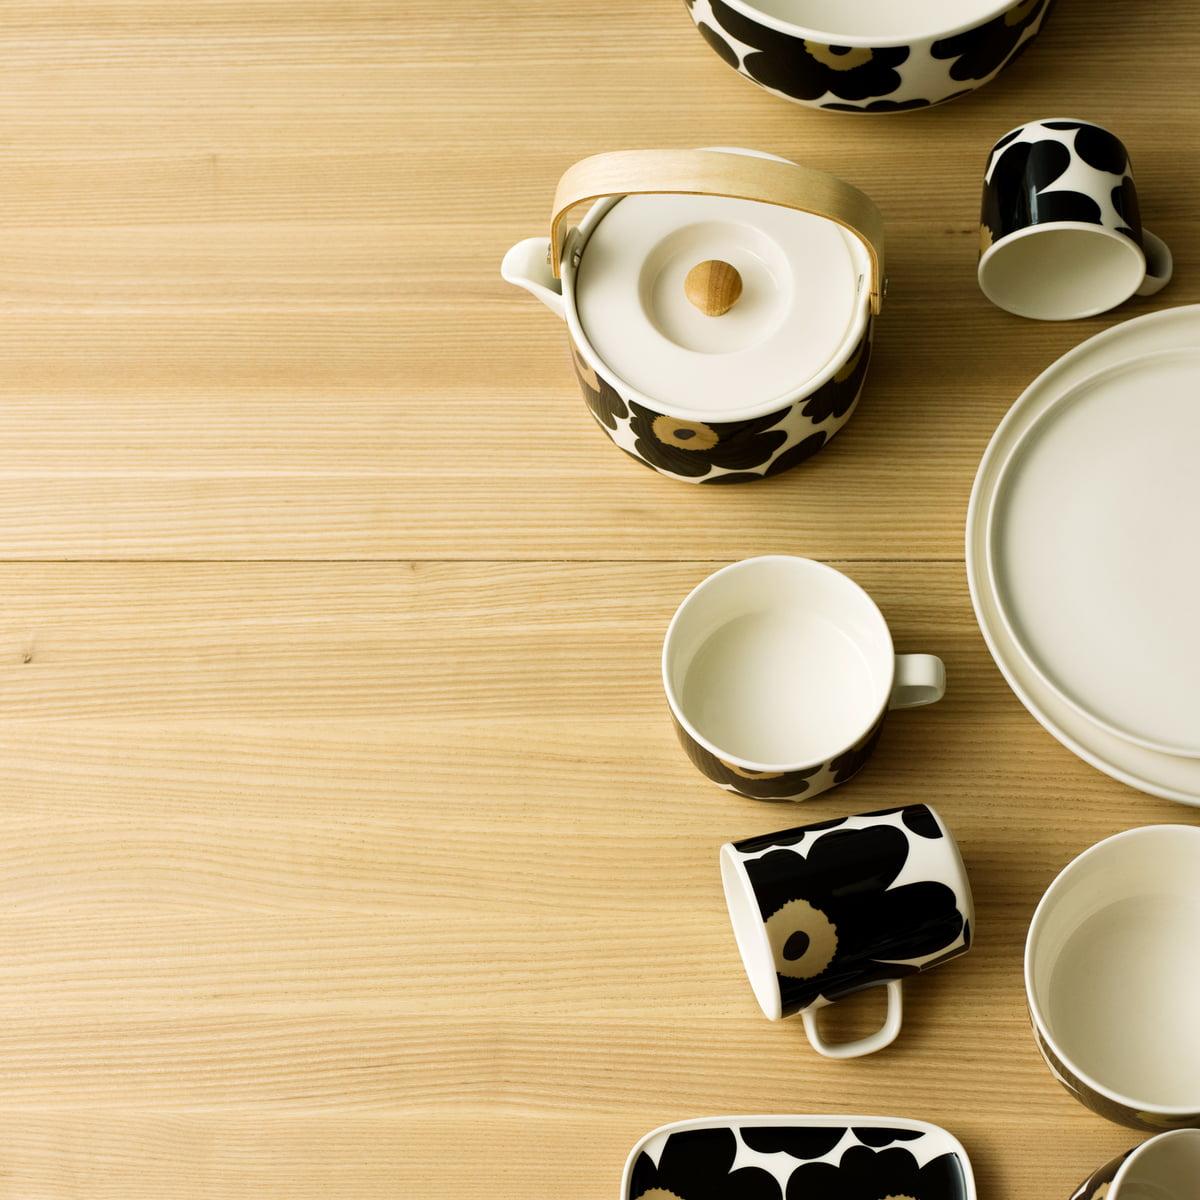 oiva unikko teekanne von marimekko bei. Black Bedroom Furniture Sets. Home Design Ideas